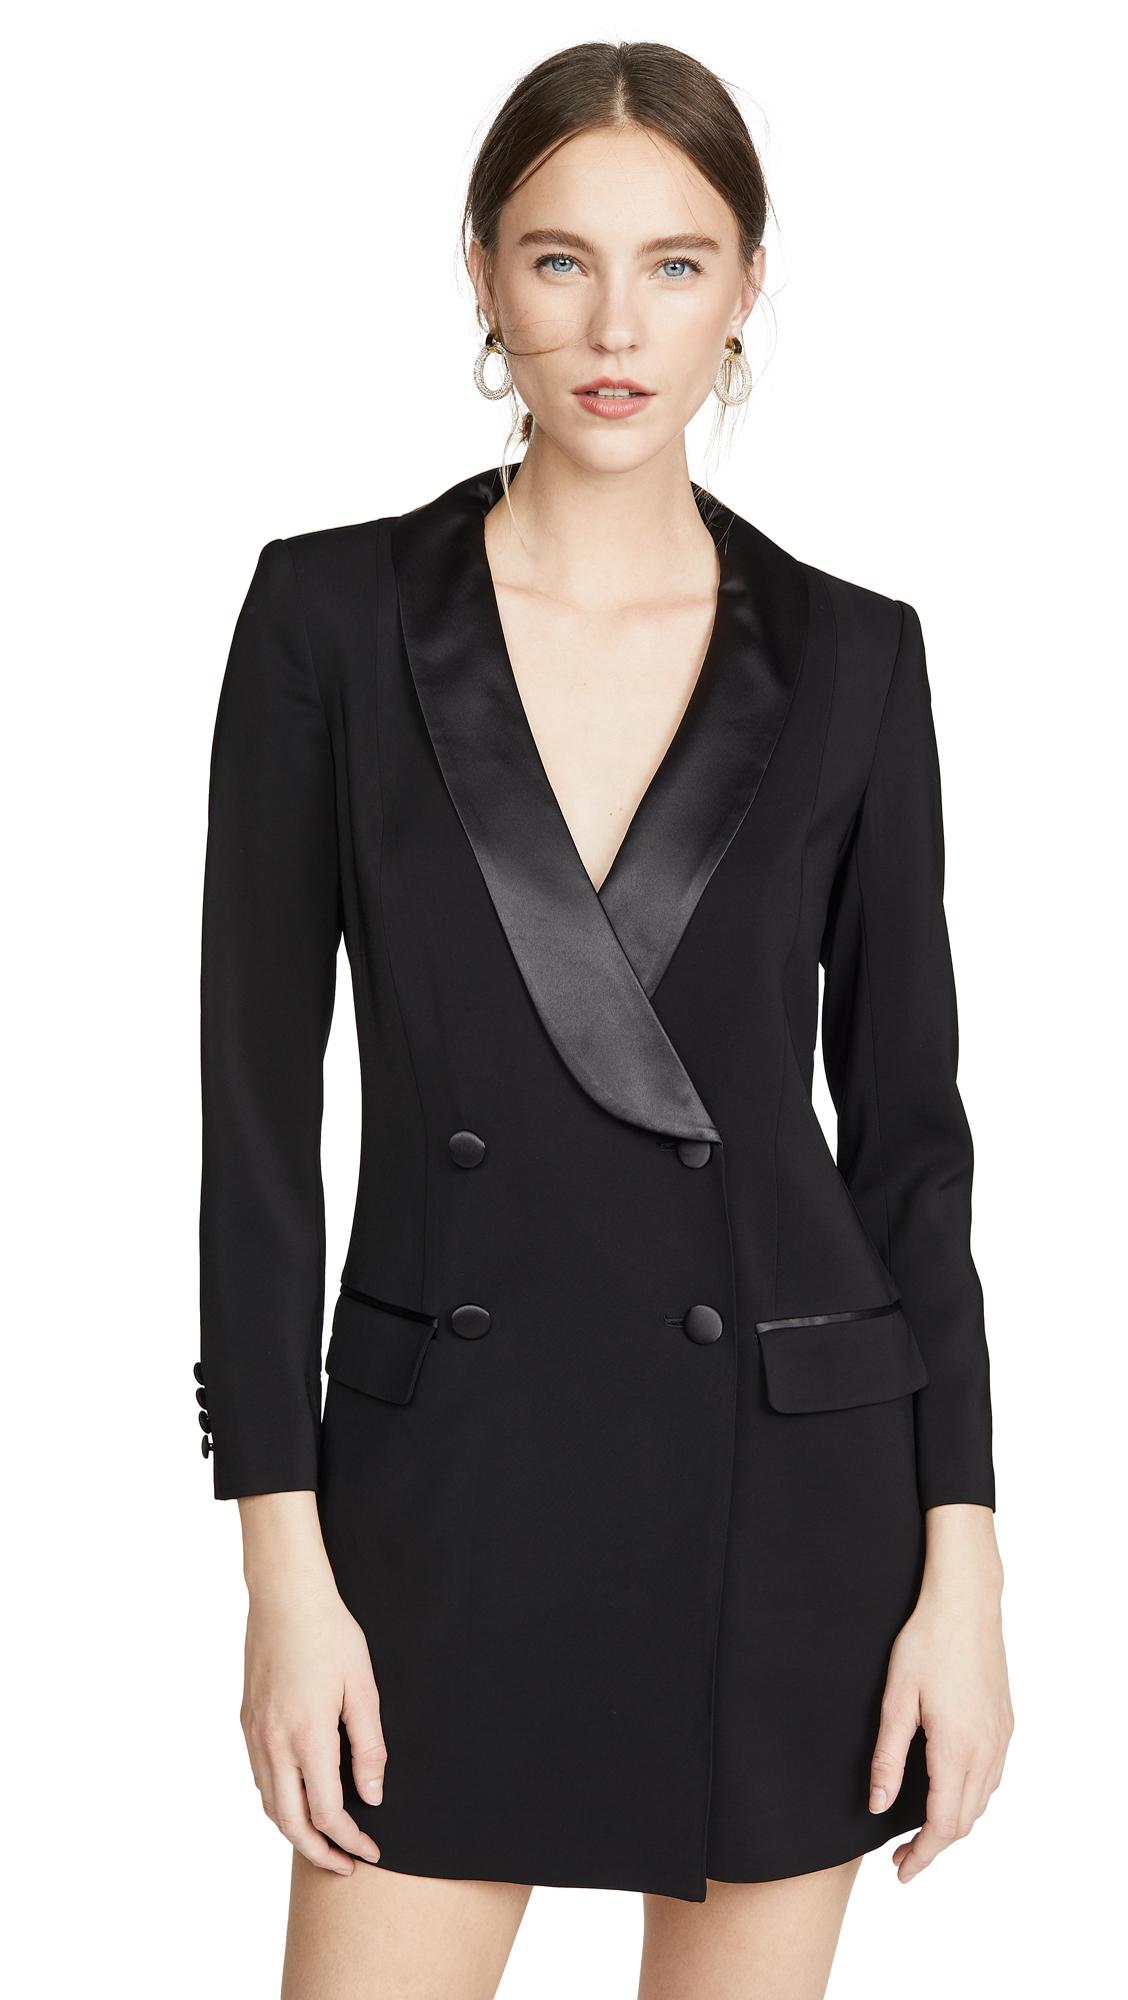 Rebecca Minkoff Archie Dress - 50% Off Sale